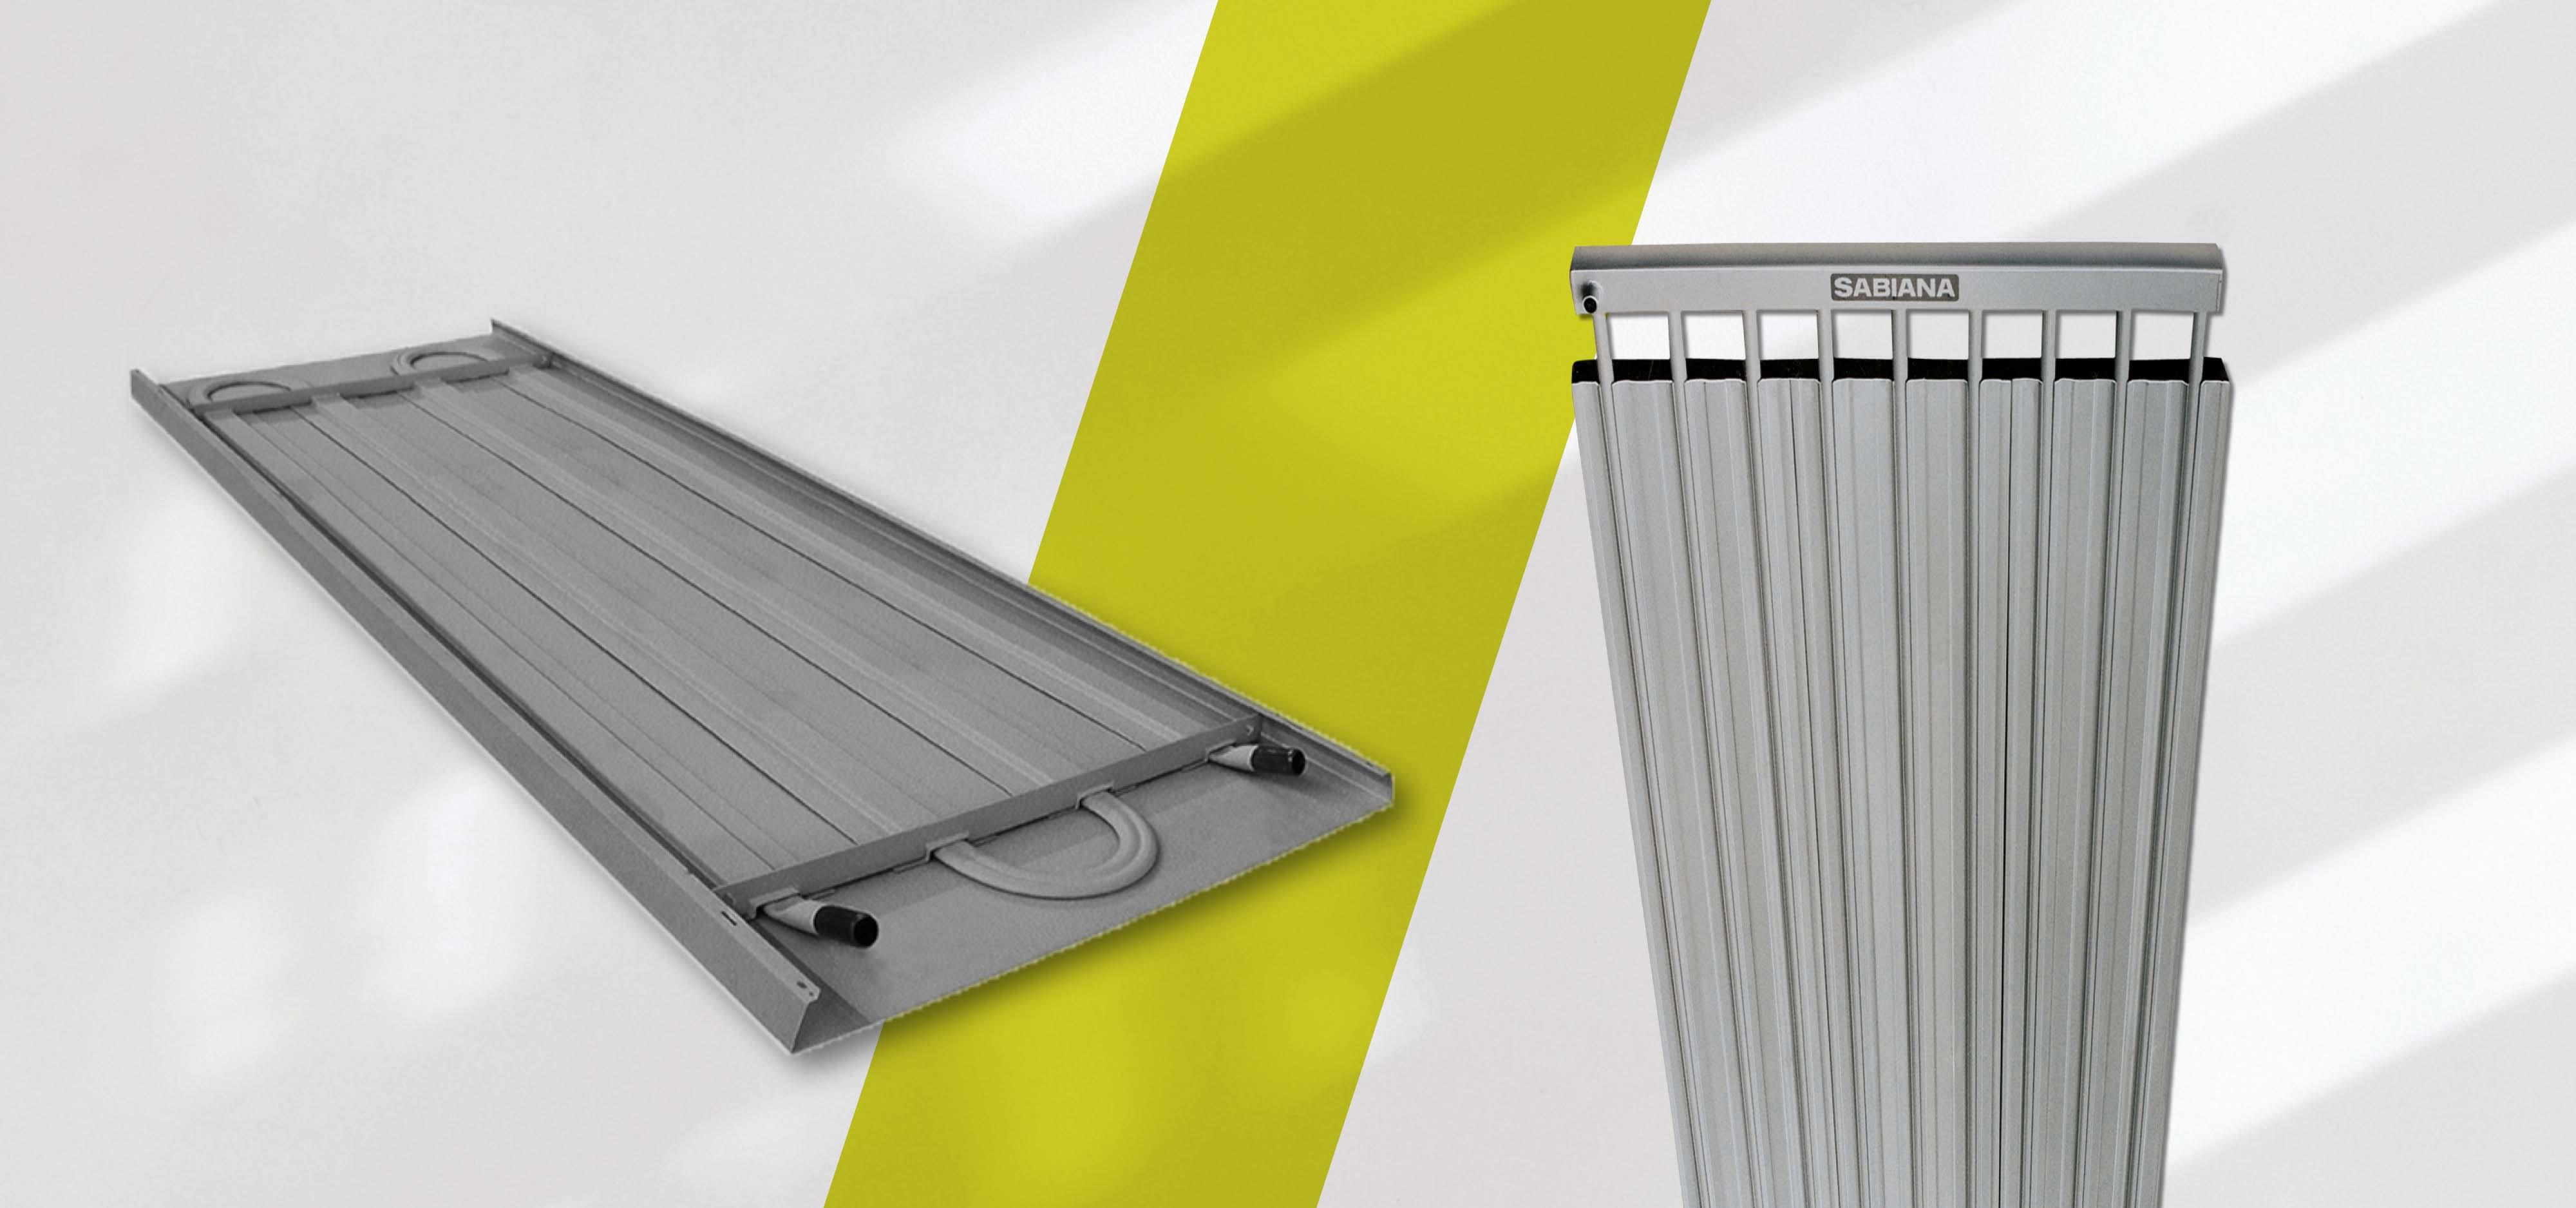 Radiant panel technology